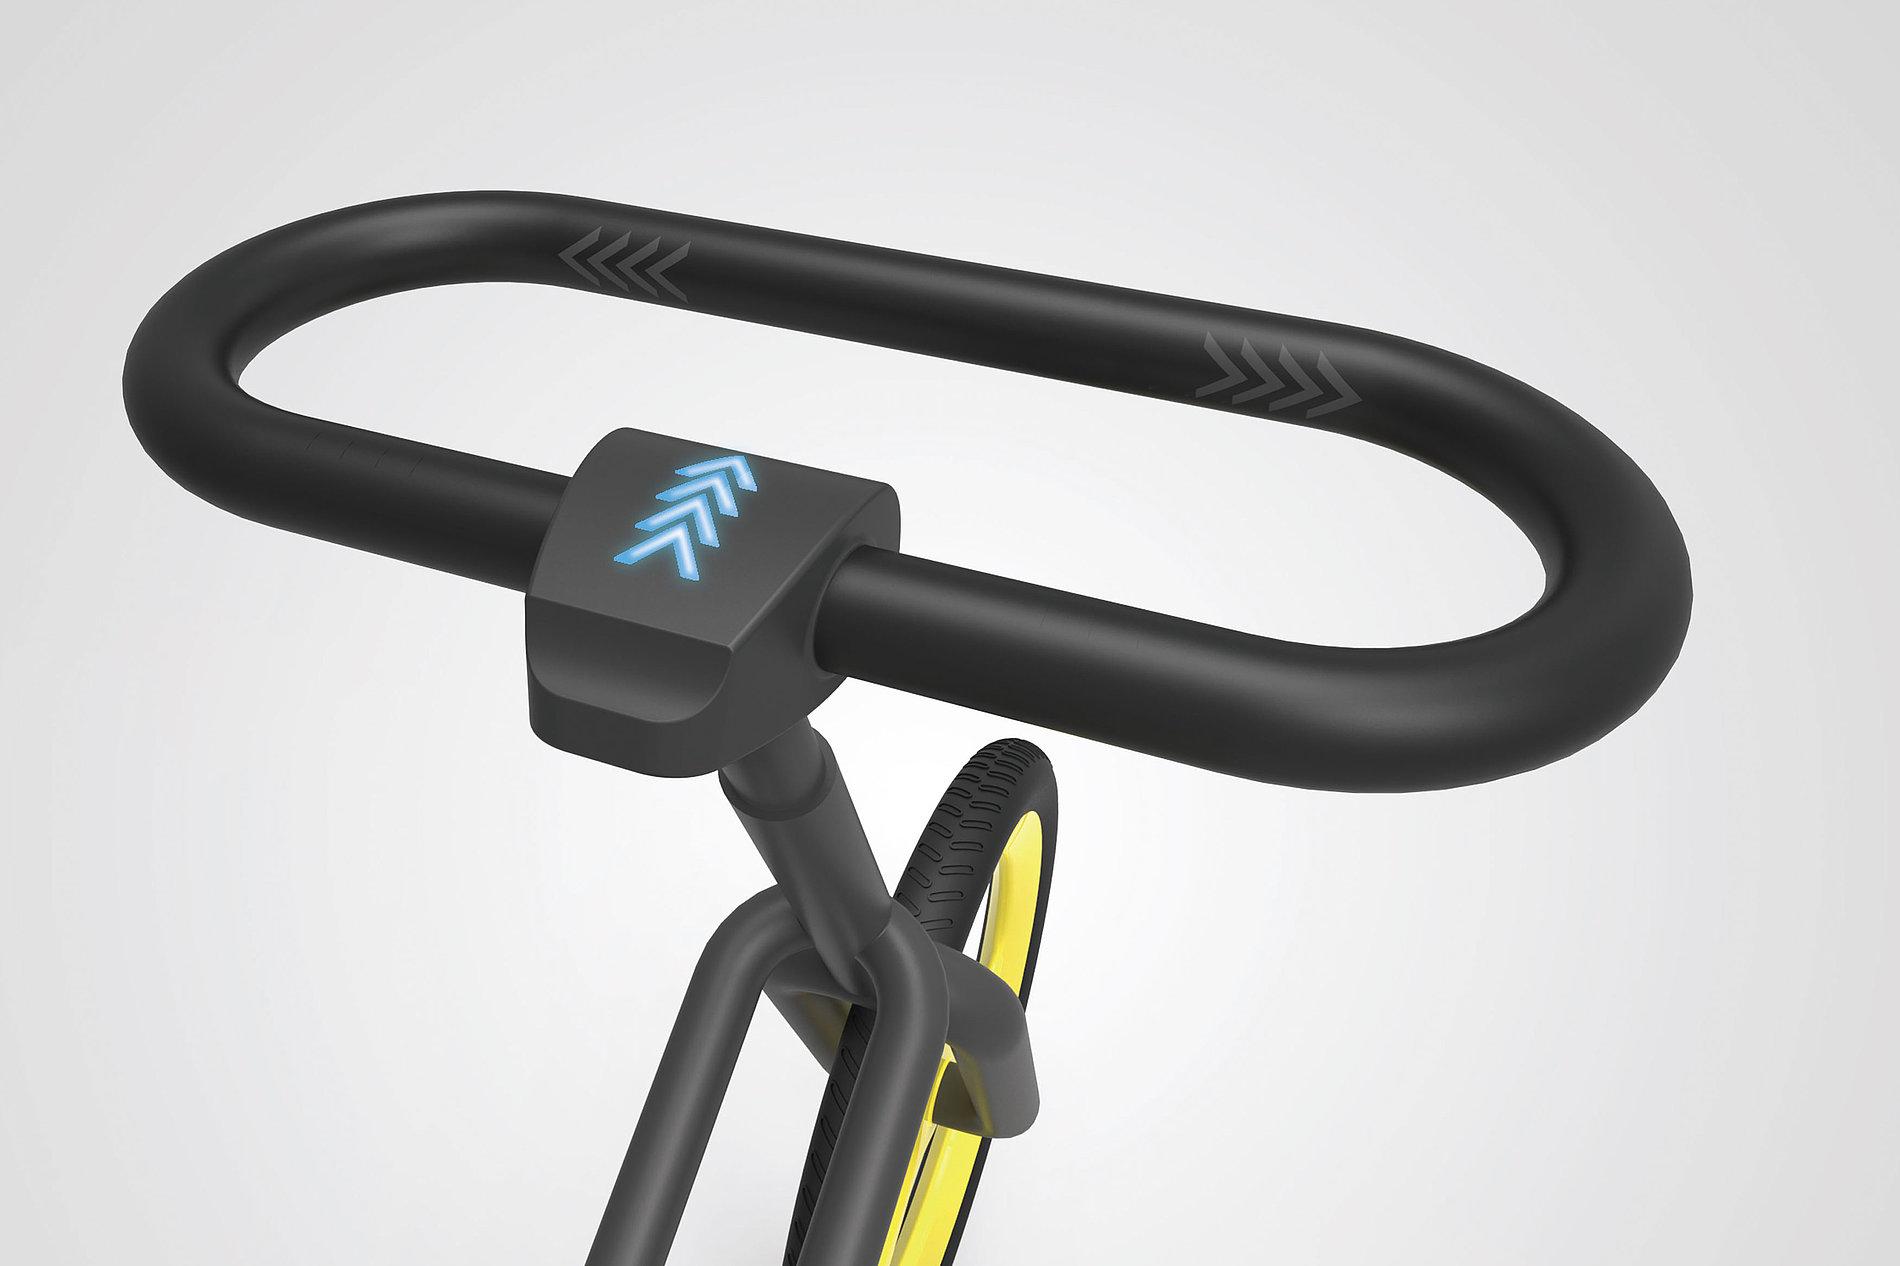 Smart Bicycle Design For Children | Red Dot Design Award